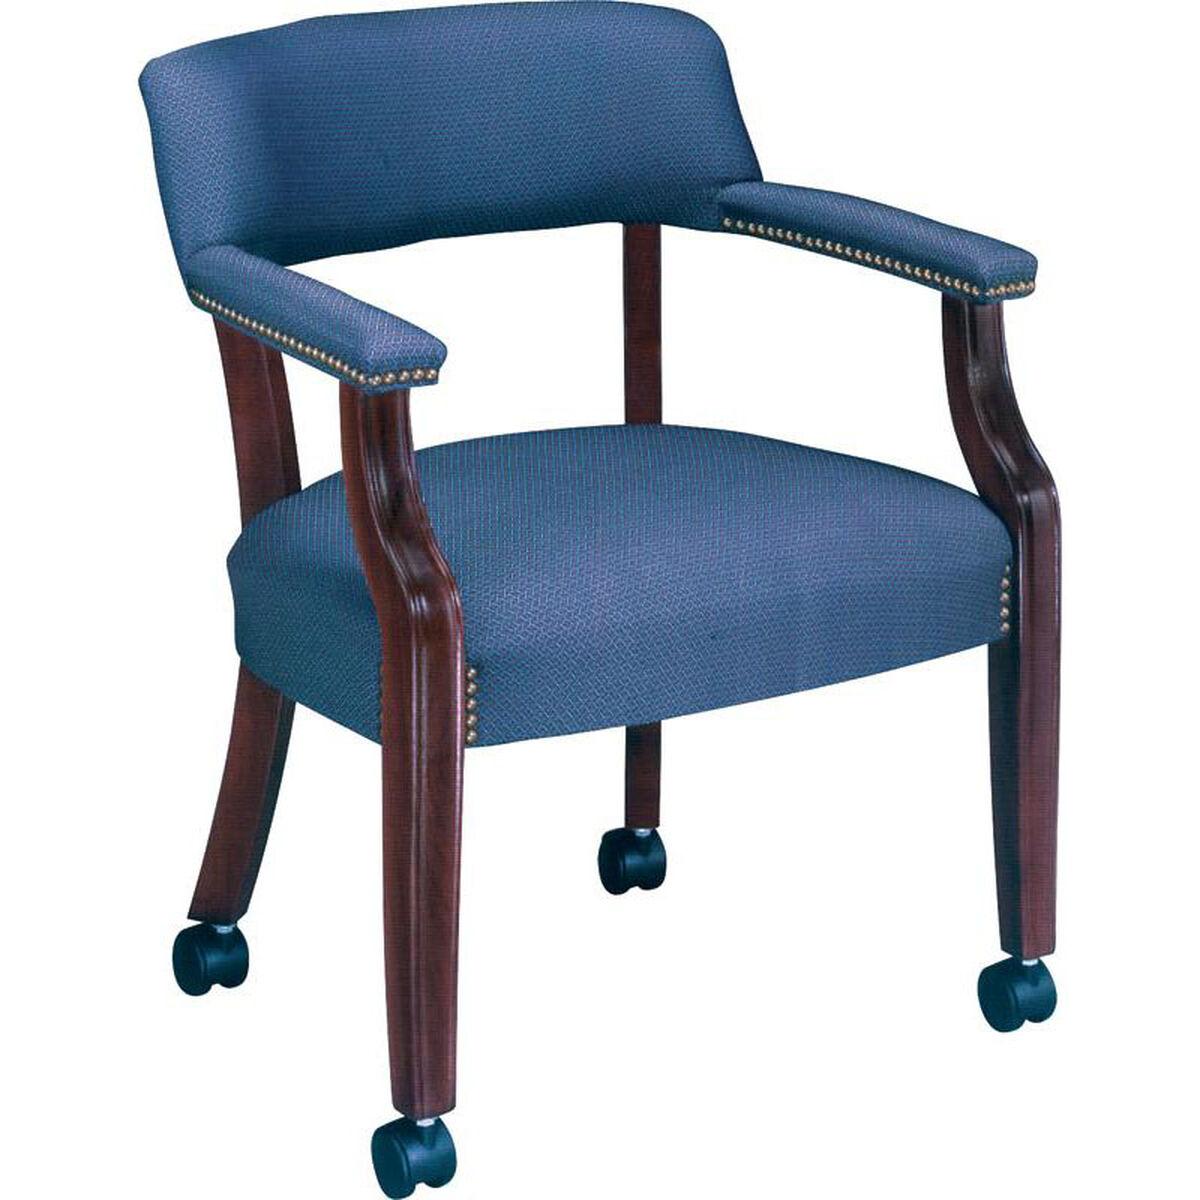 High Point Furniture Industries 2013 Hpf